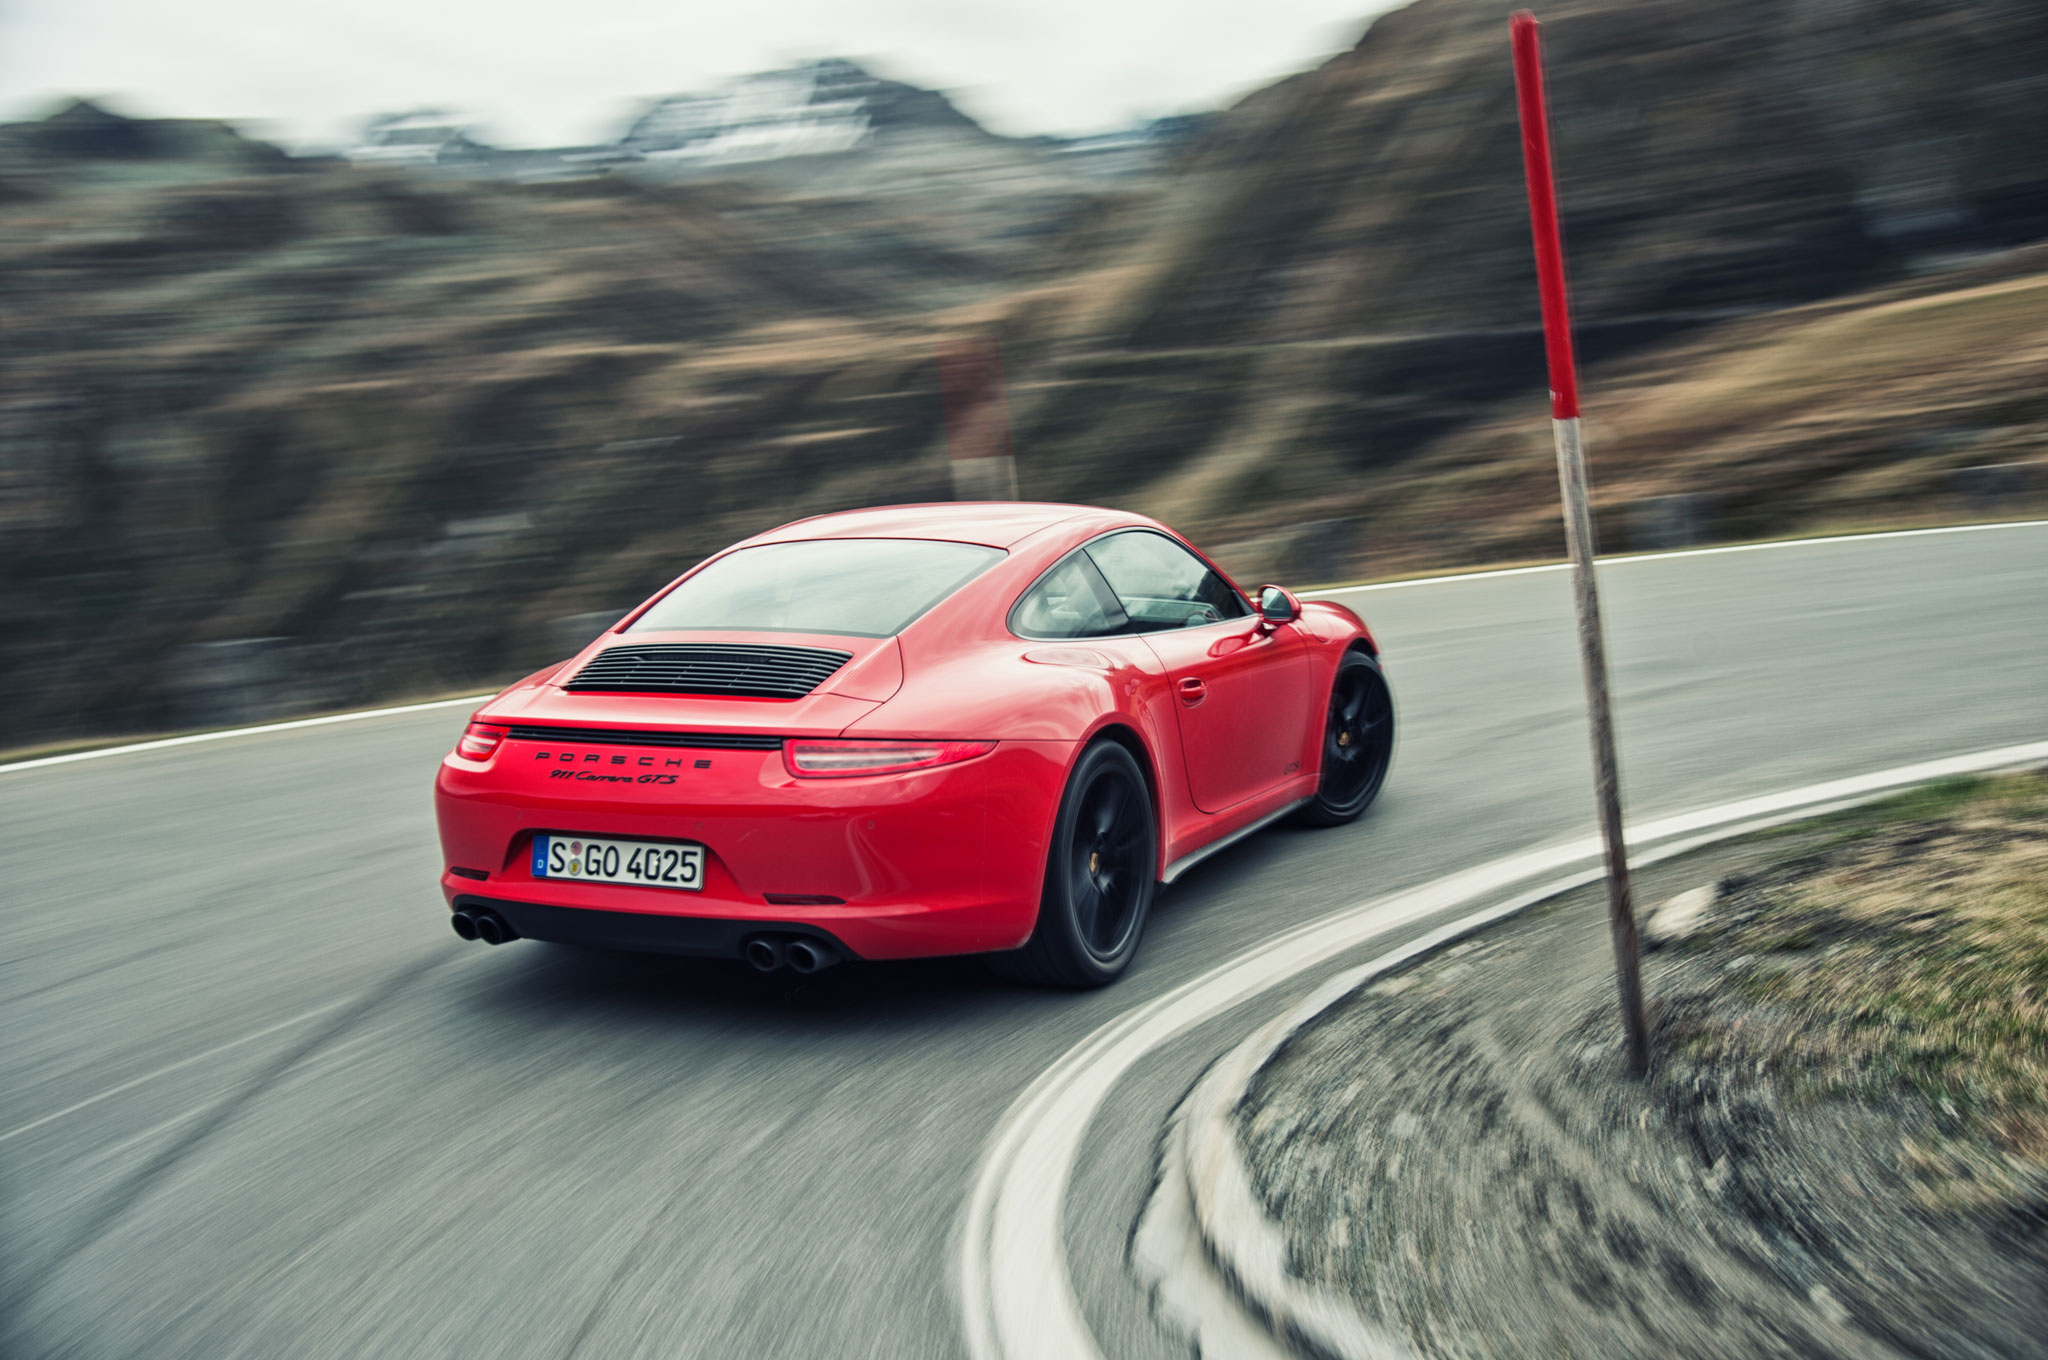 2015 Porsche 911 Carrera Gts Debuts With 430 Hp